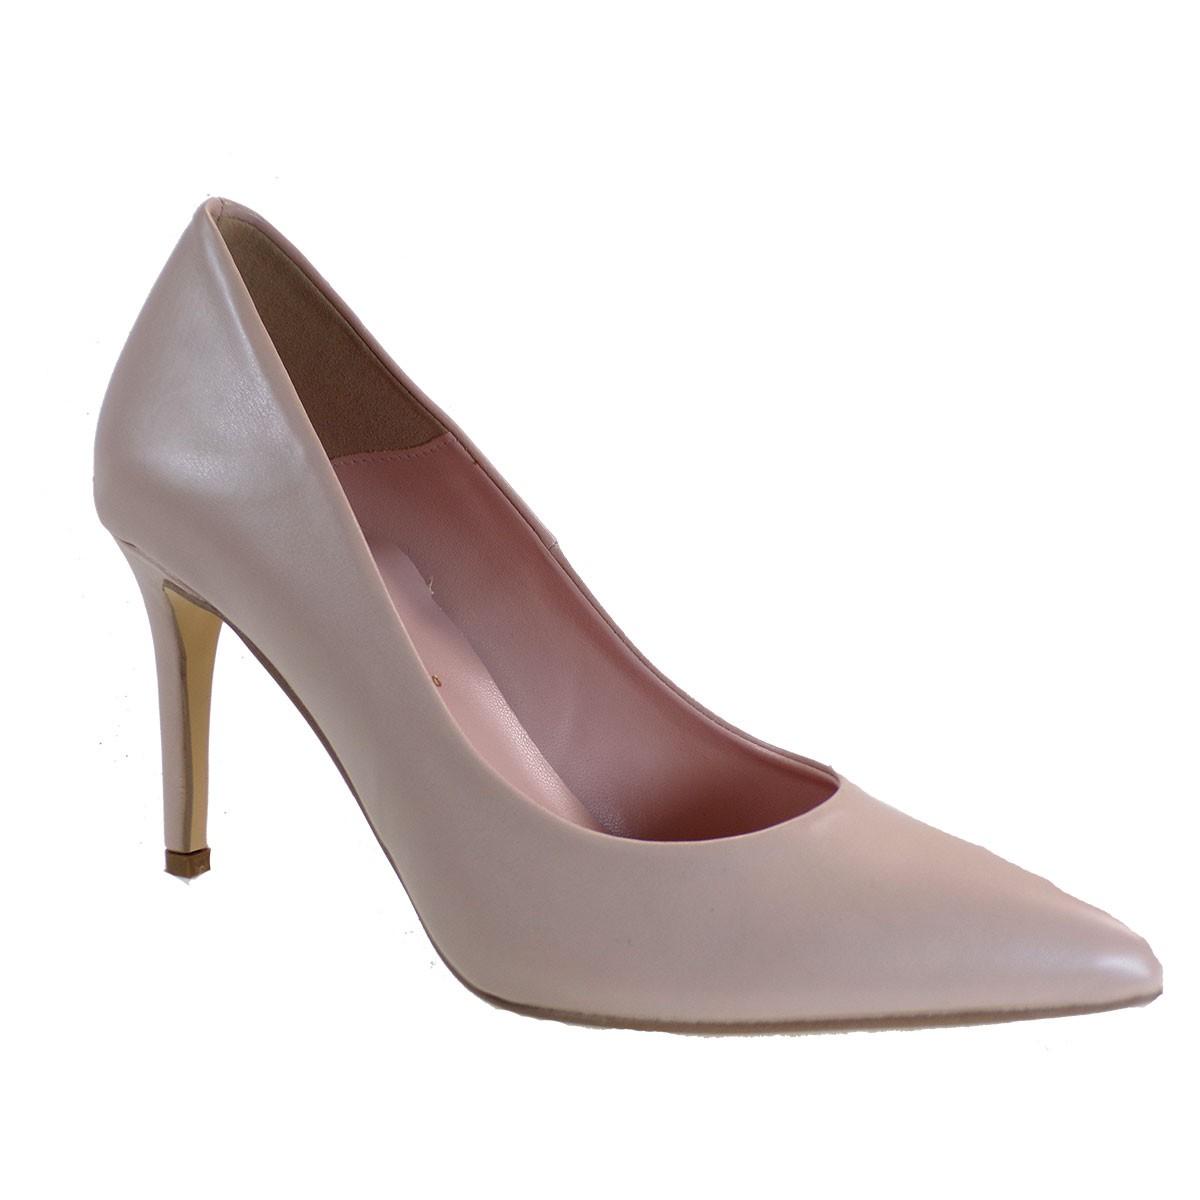 Alessandra Paggioti Γυναικεία Παπούτσια Γόβες 81001 Nude Mατ